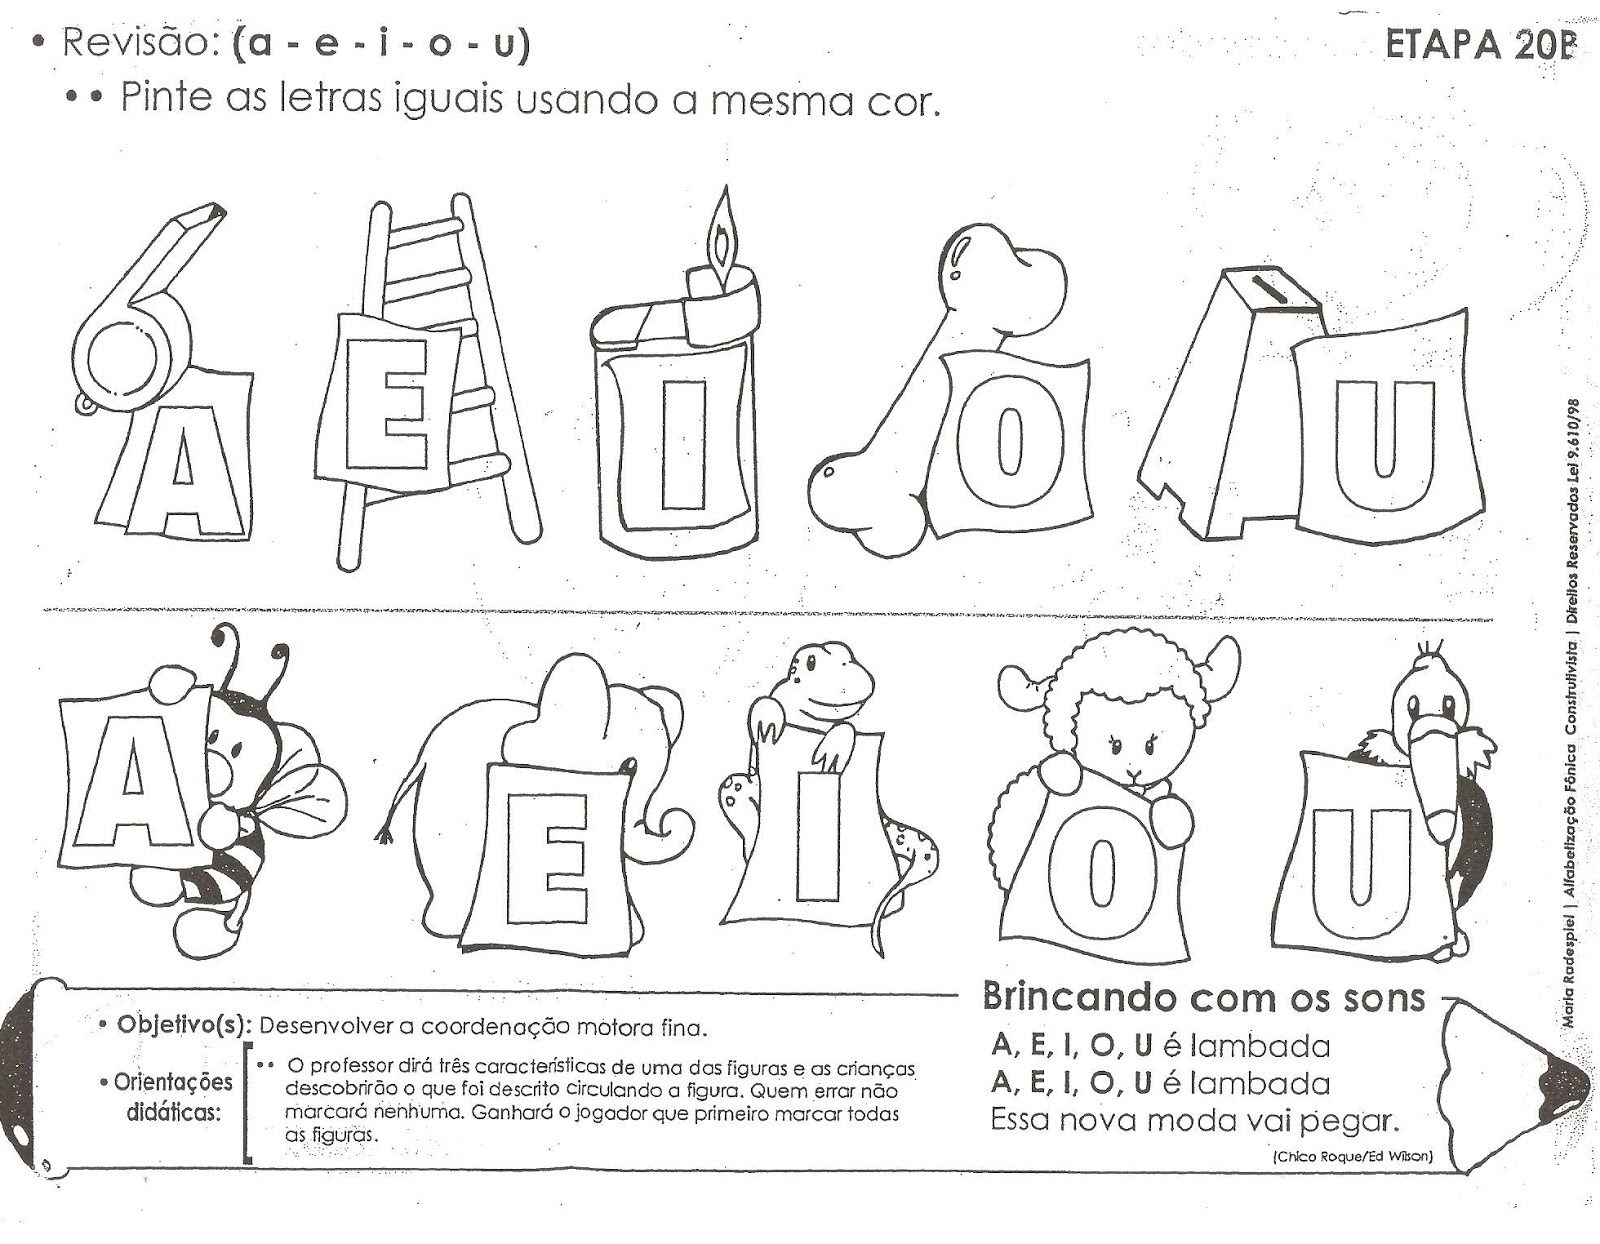 17 best images about atividades com as vogais on pinterest